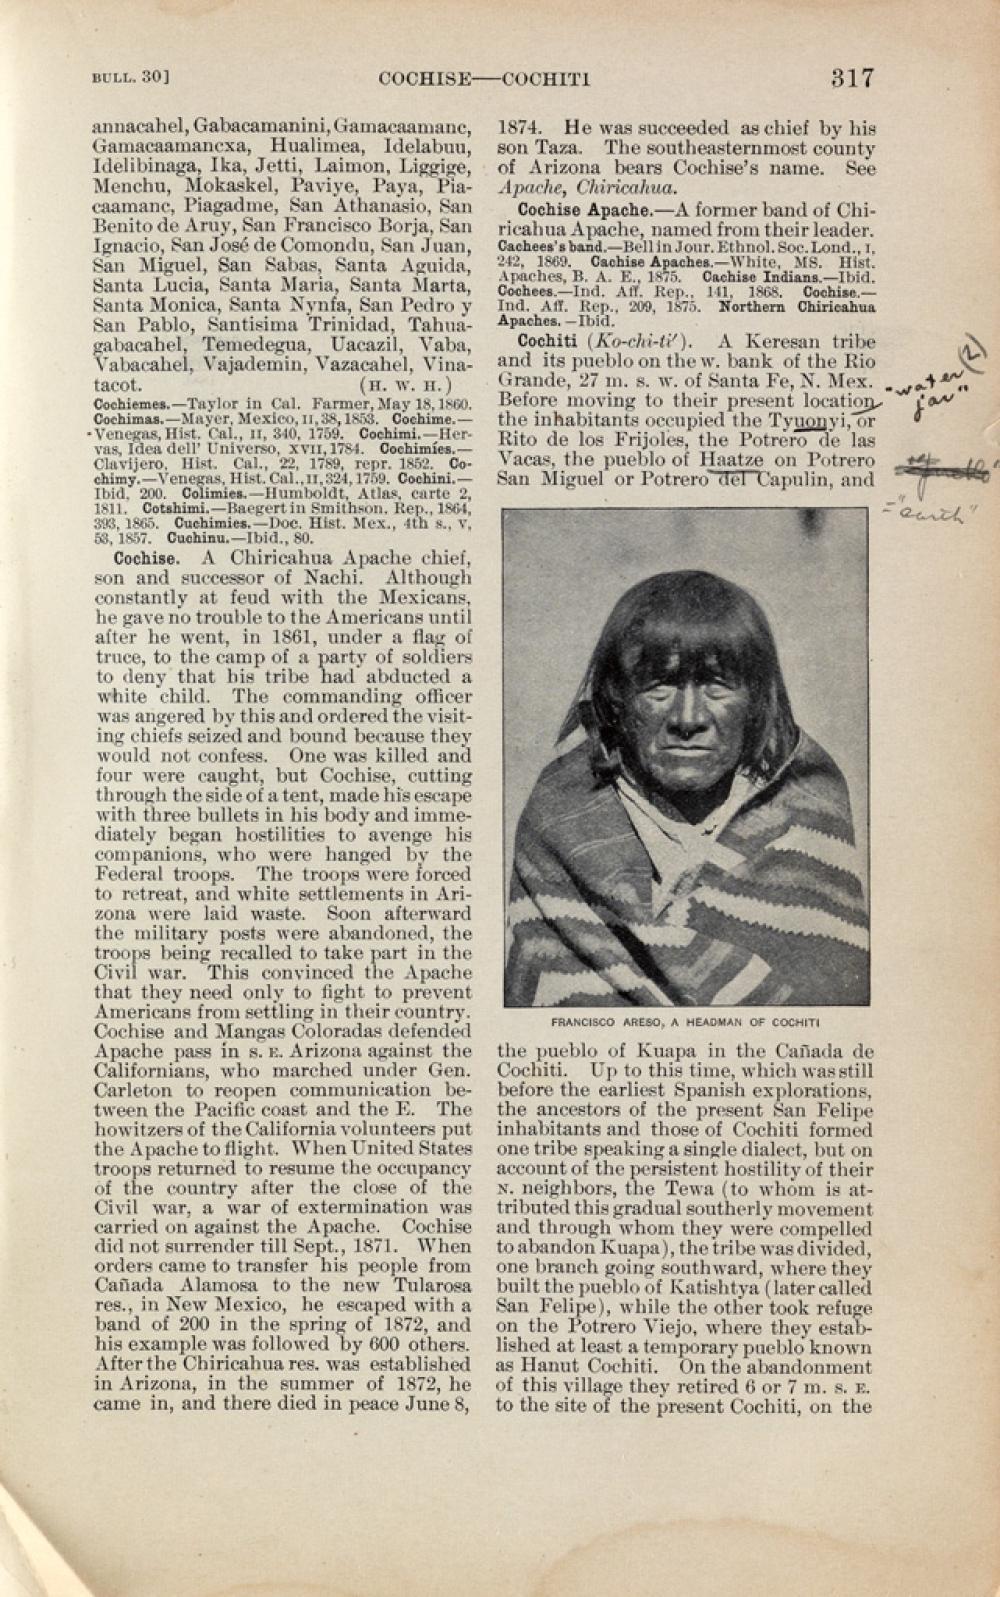 (EDWARD S. CURTIS.) Handbook of American Indians, Part 1, A-M, Bulletin #30 * Handbook of American Indians, Part 2, N-Z, Bulletin #30,